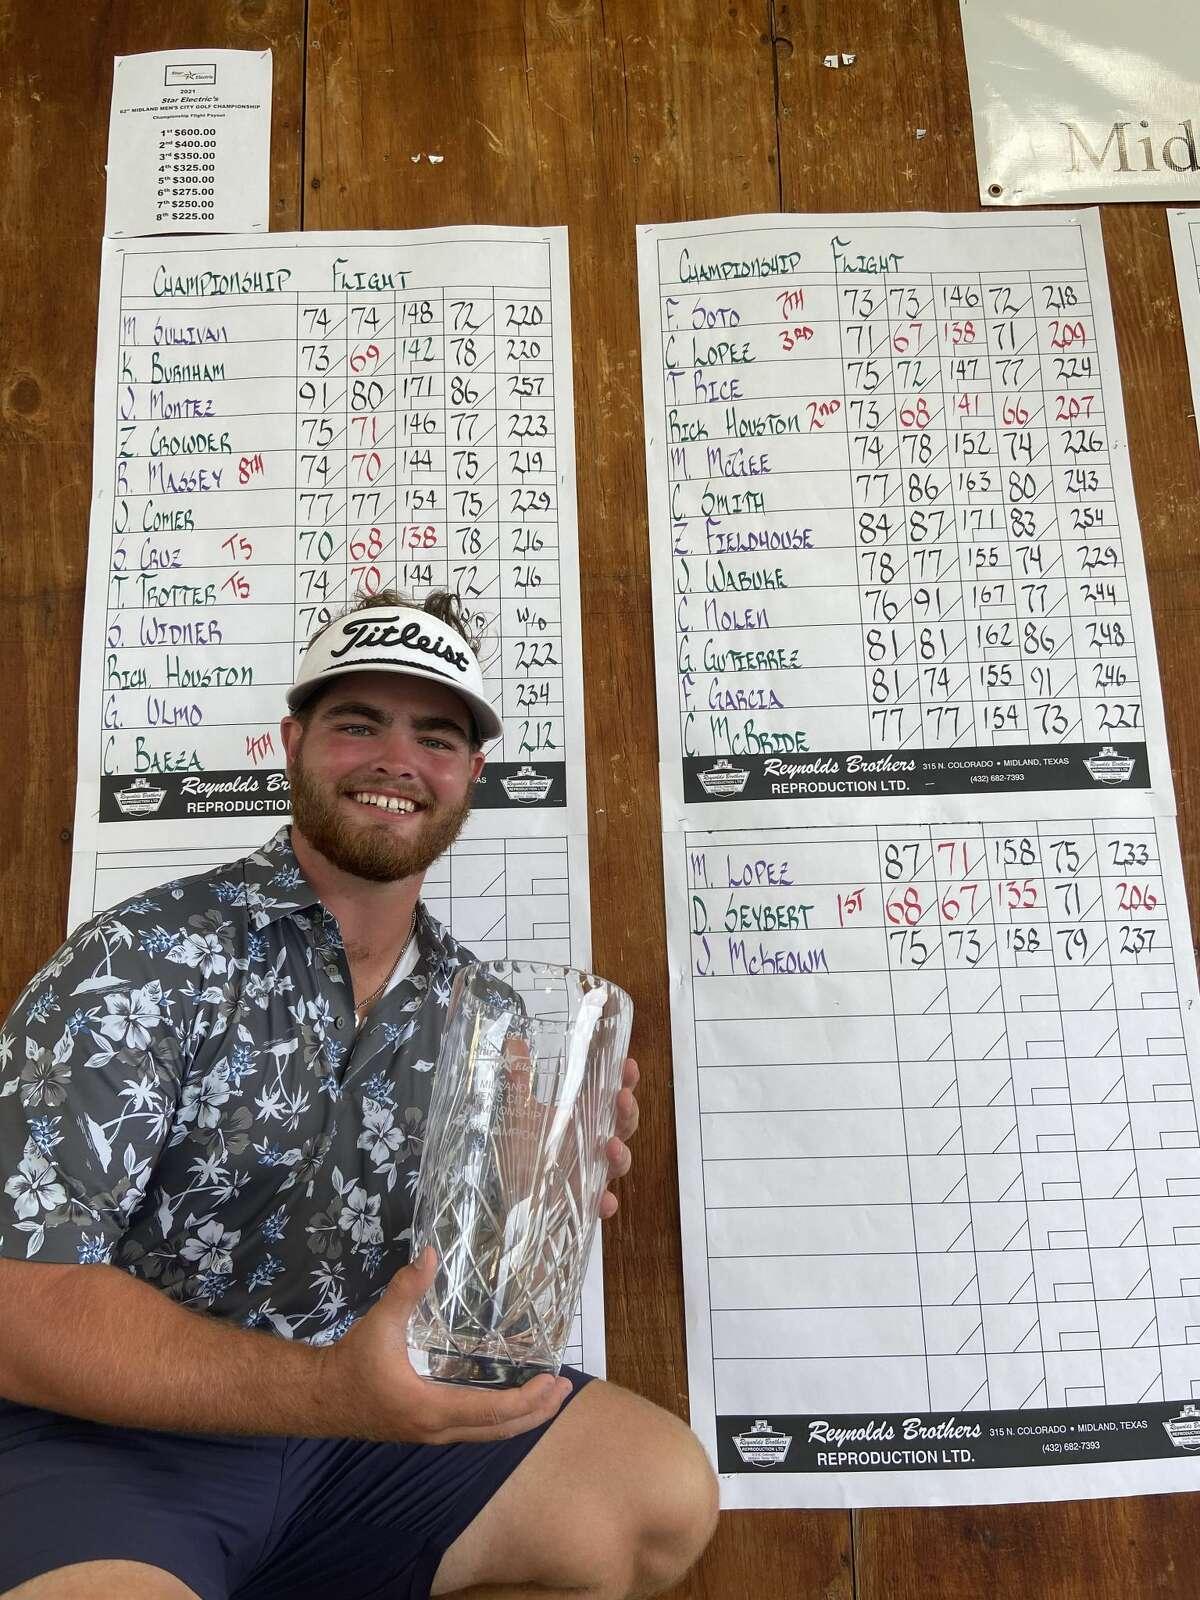 Davis Seybert holds the glass vase trophy after winning the Star Electric Midland Men's City Championship, Aug. 1 at Hogan Park Golf Course.